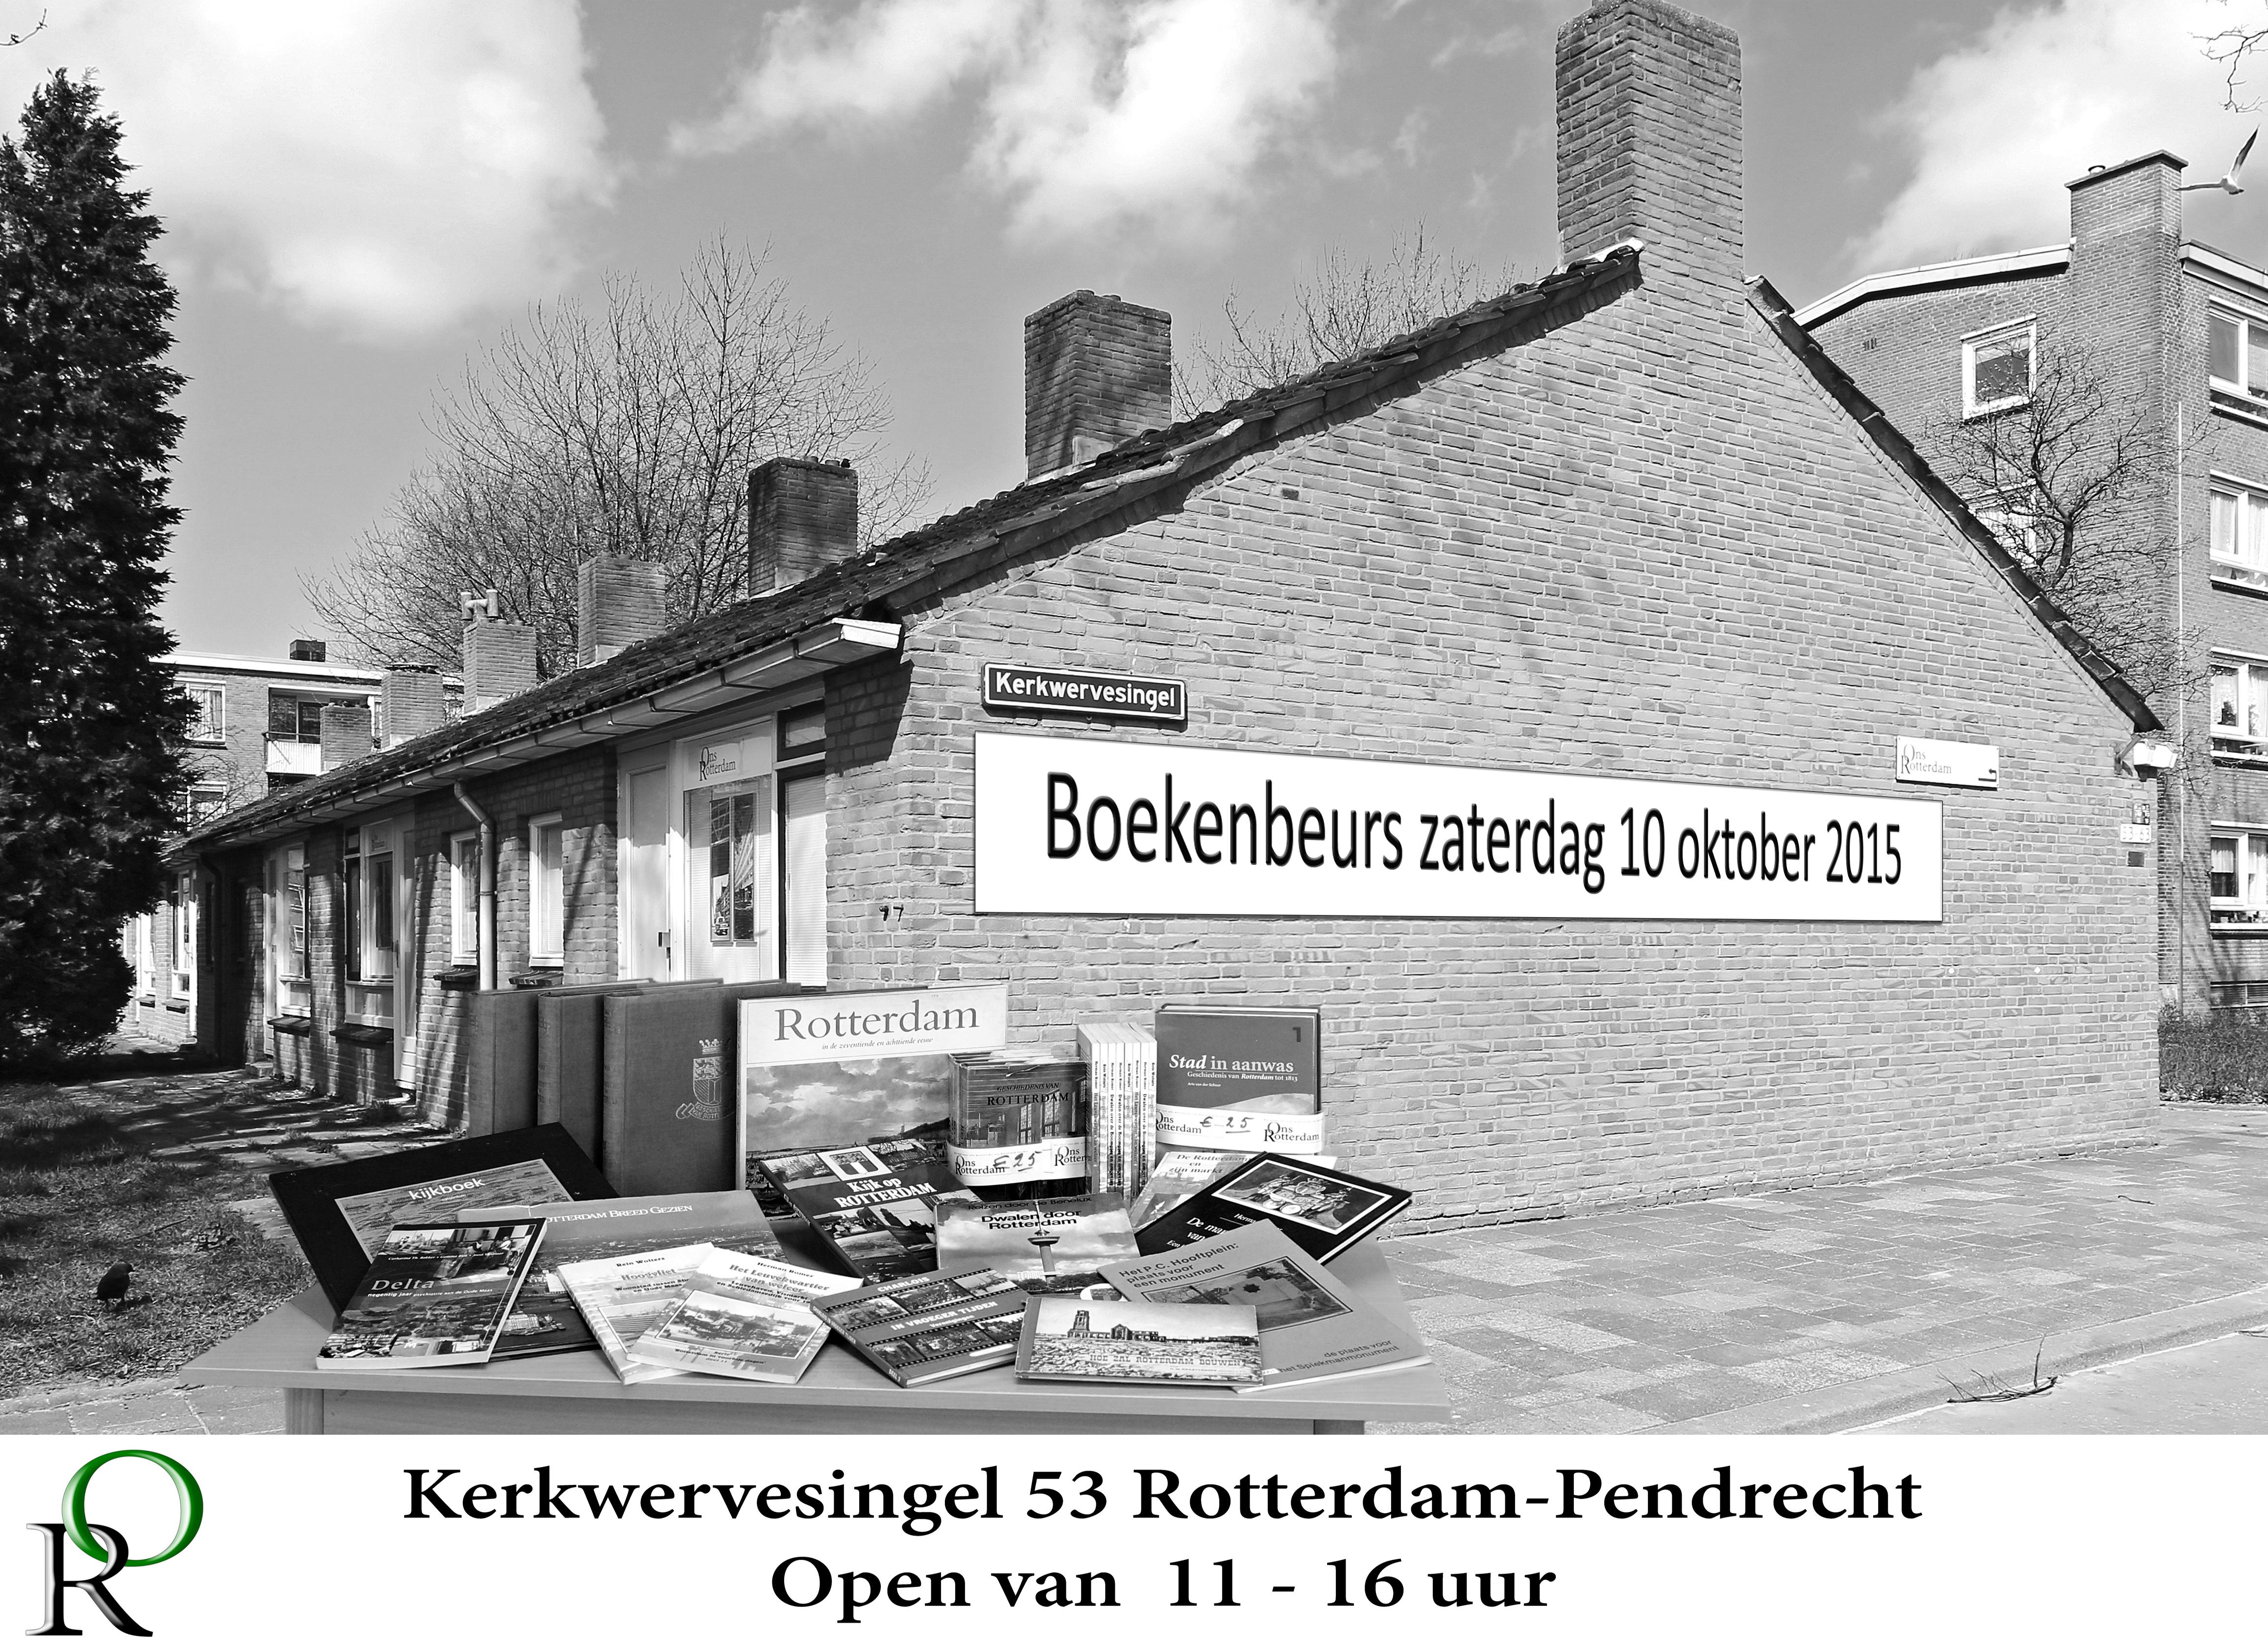 Stichting Ons Rotterdam houdt boekenbeurs